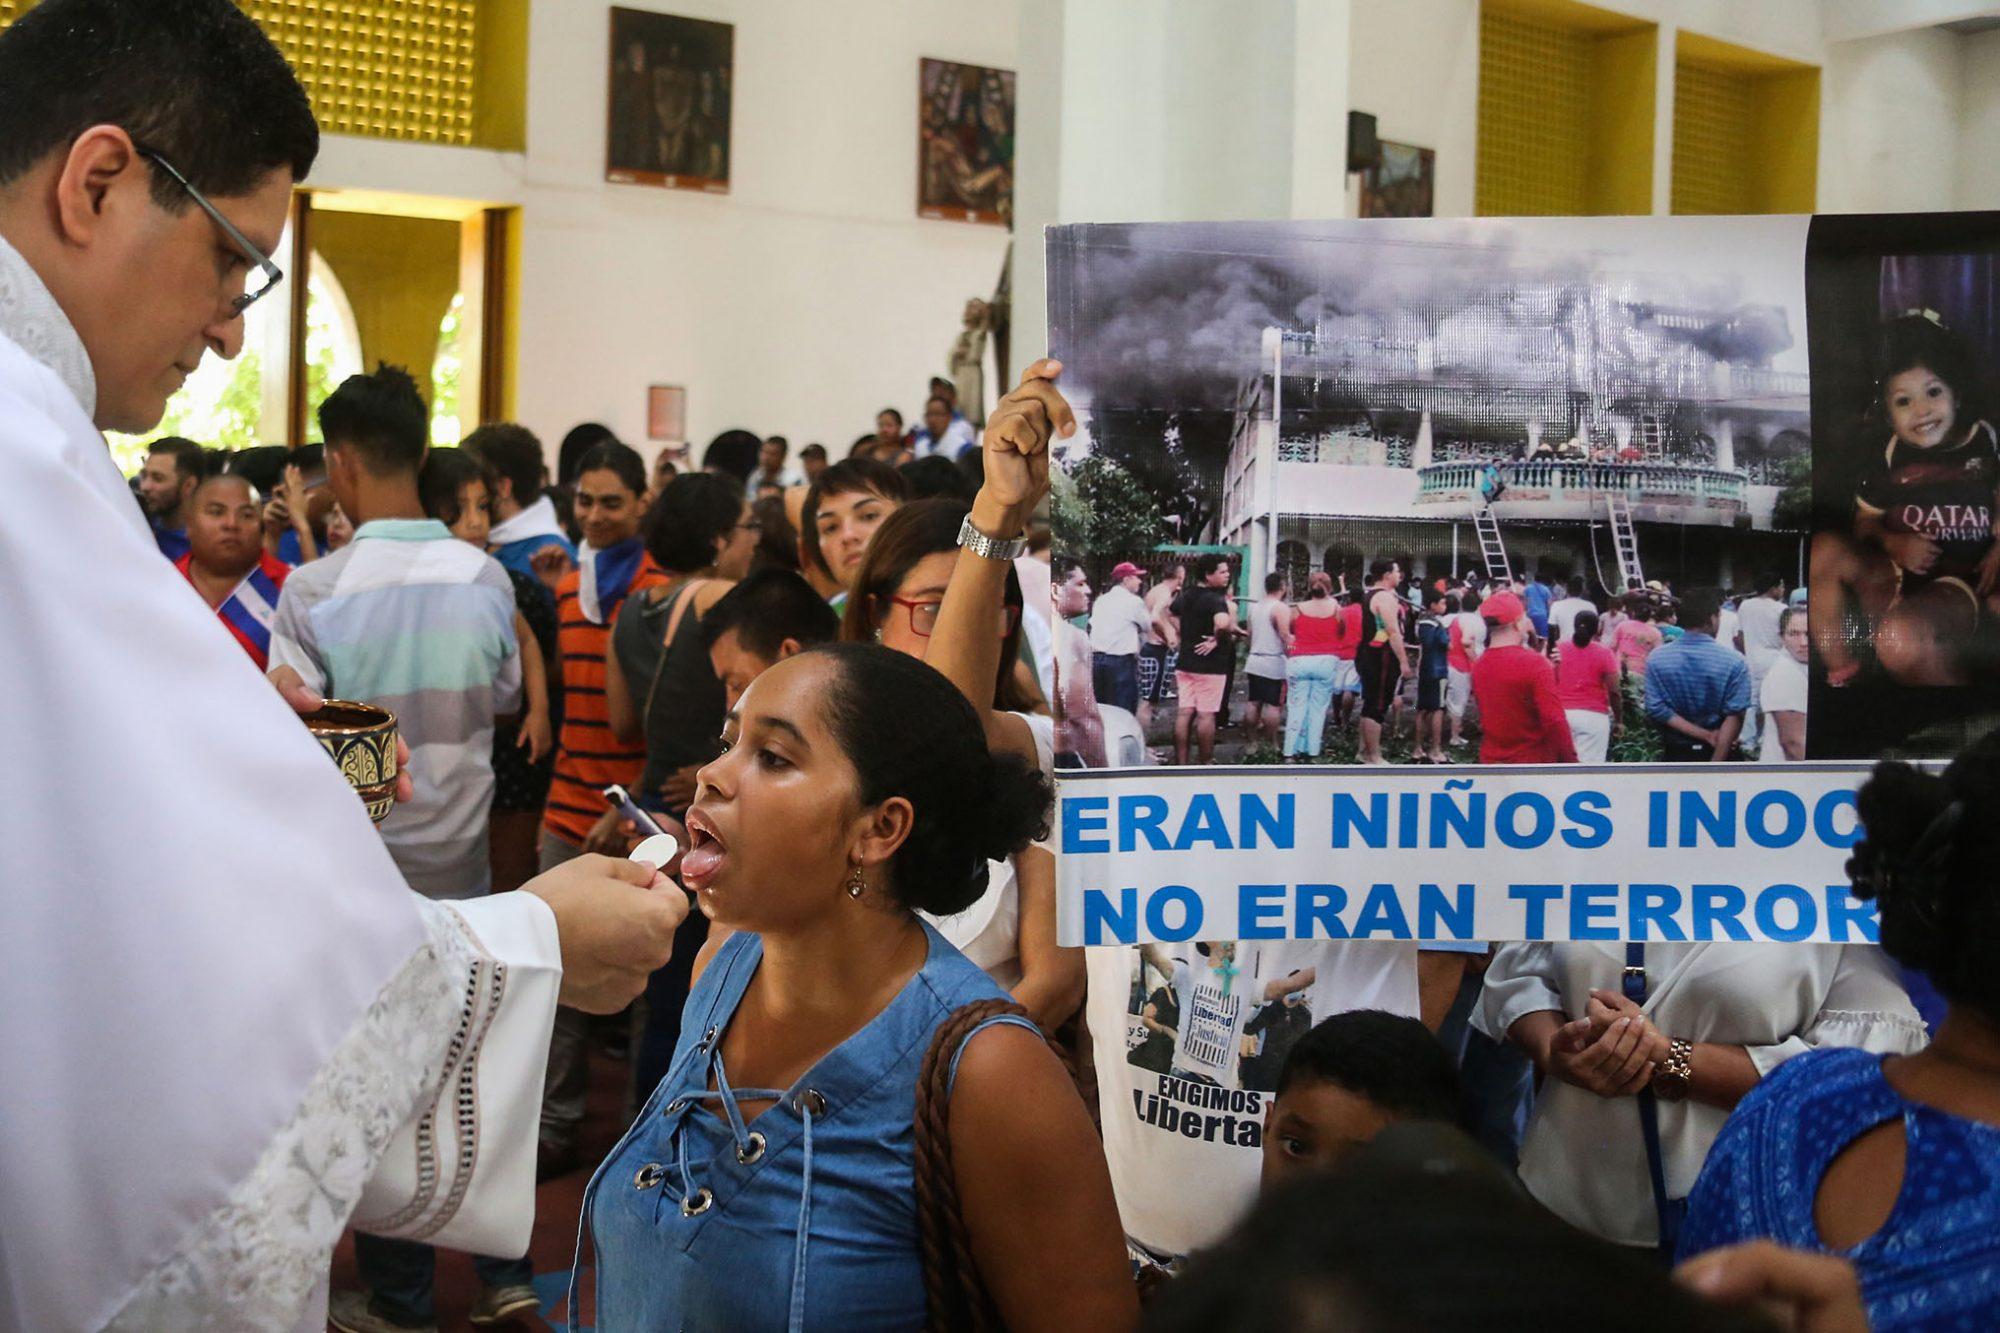 NICARAGUA-CRISIS-PRISONER-RELEASE